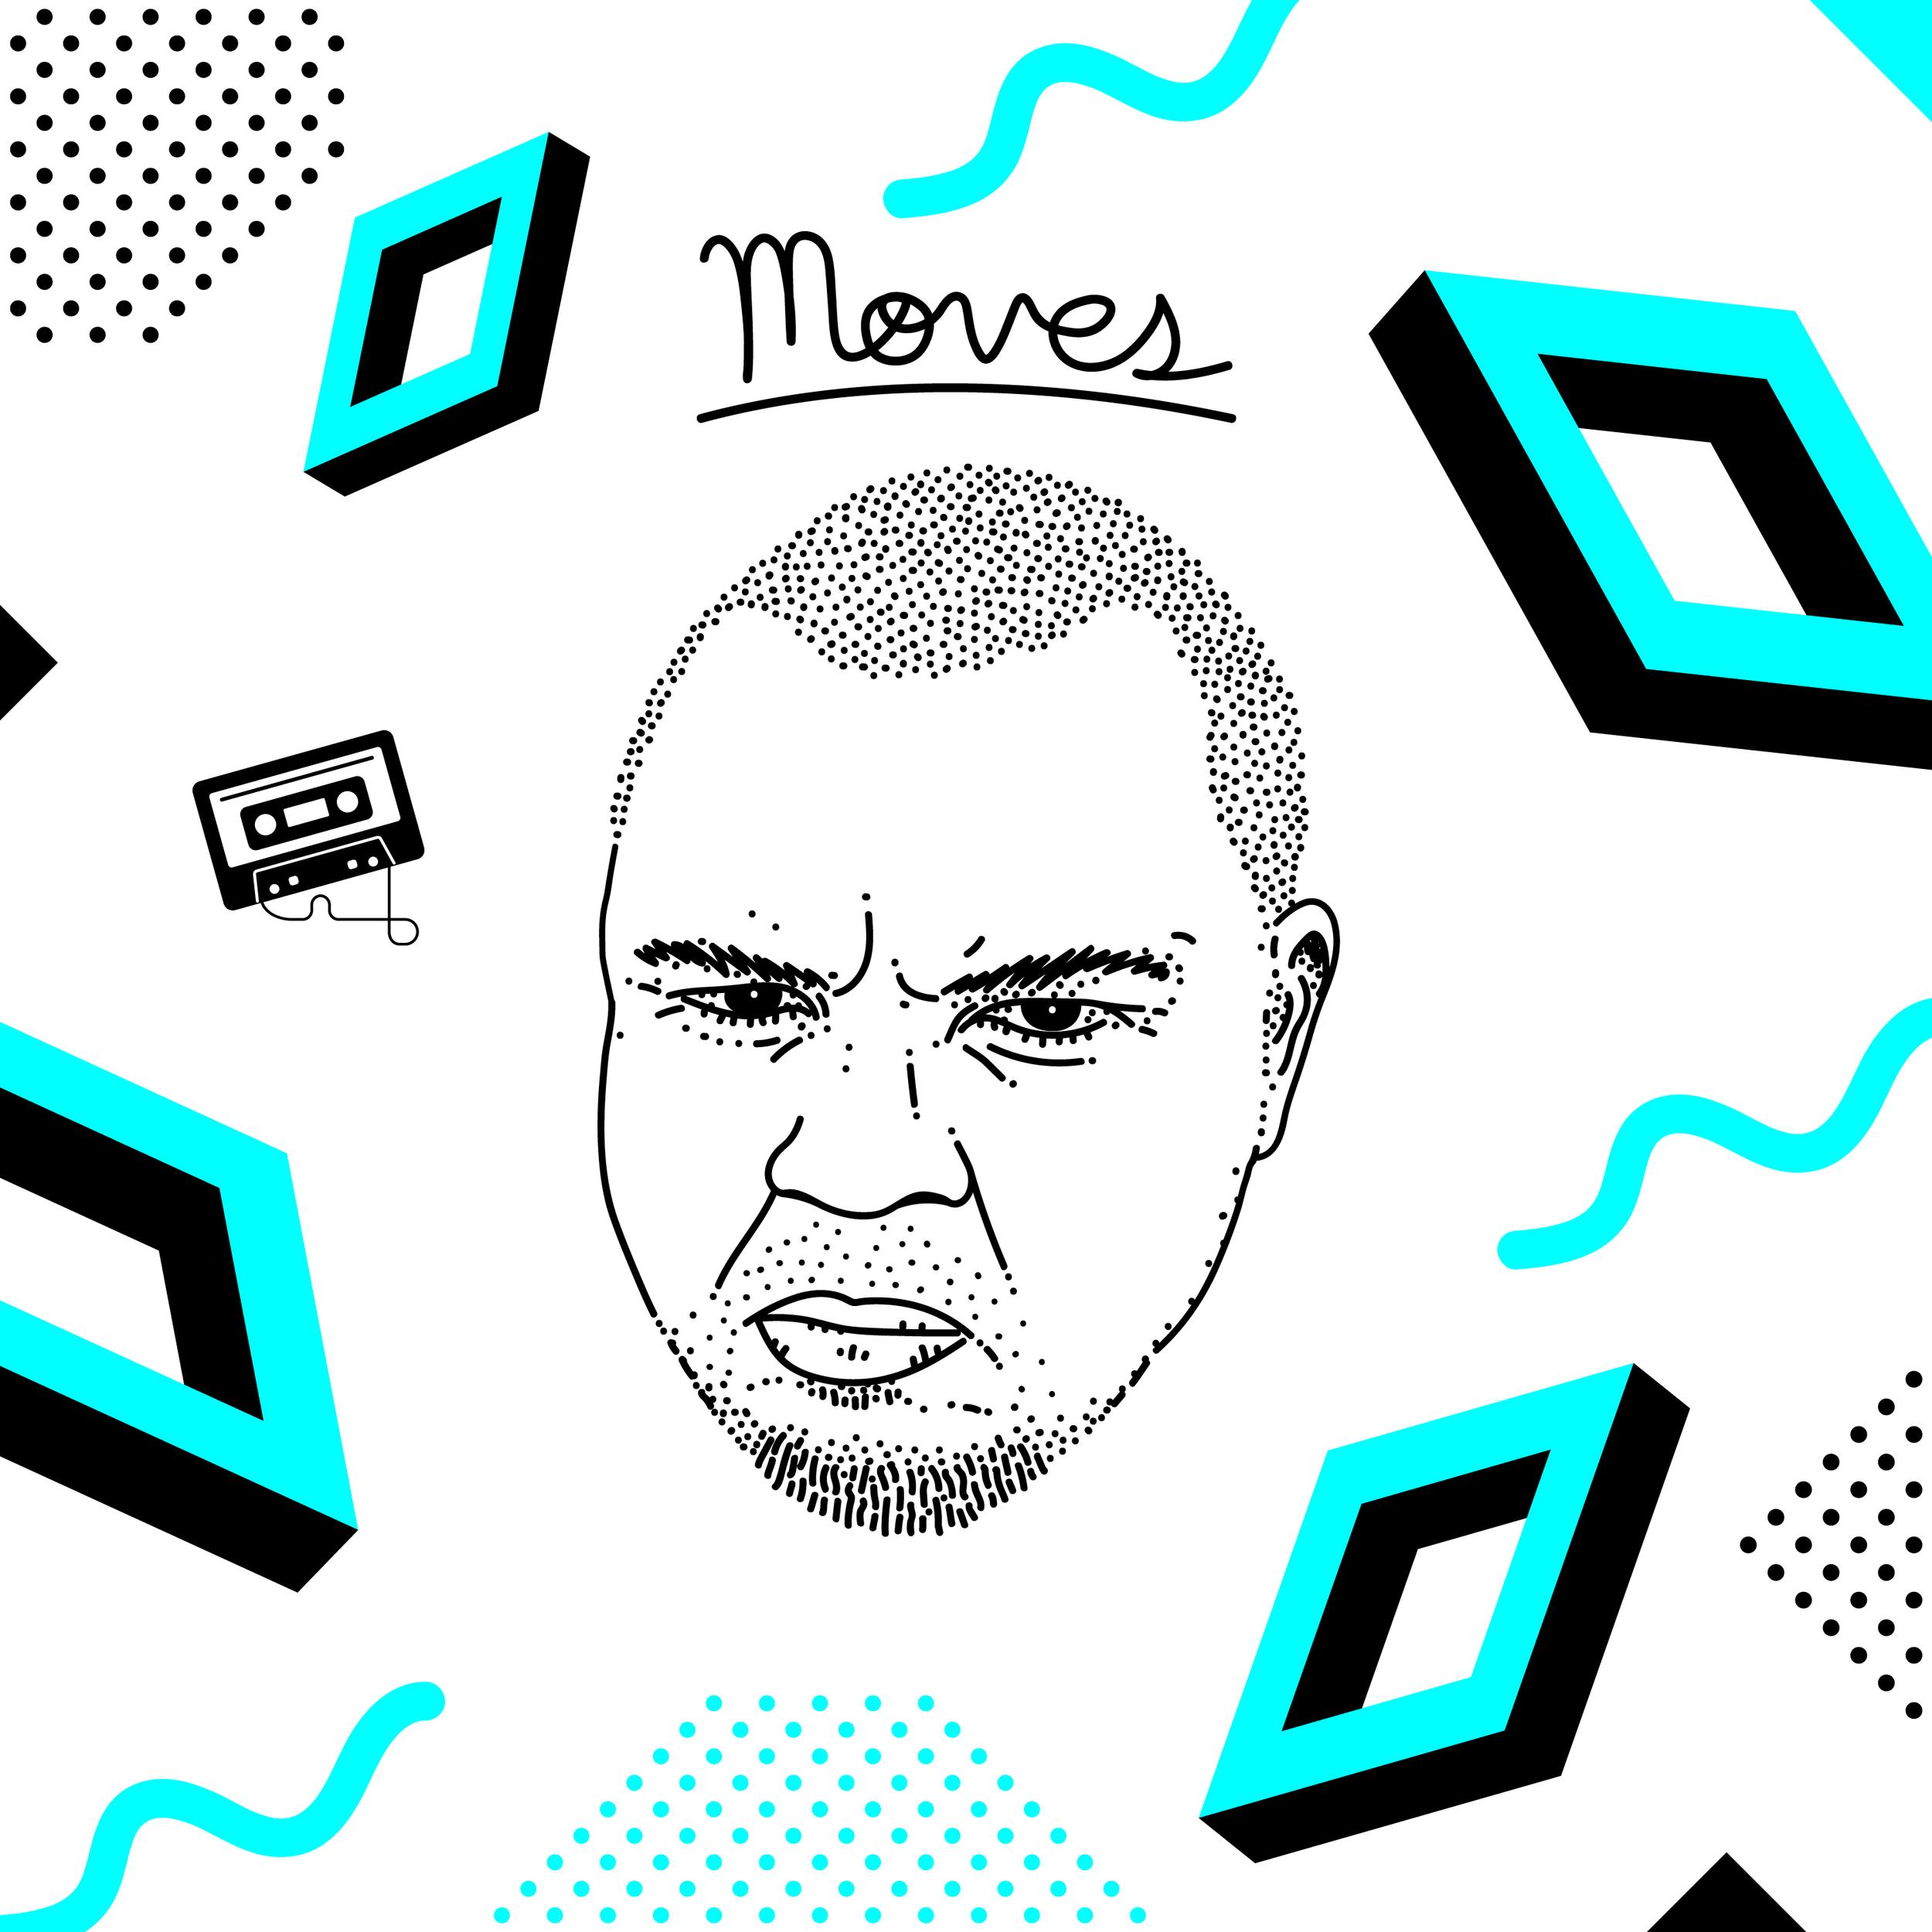 Episode 12 - DJ Moves - Low Pressure Fried Chicken